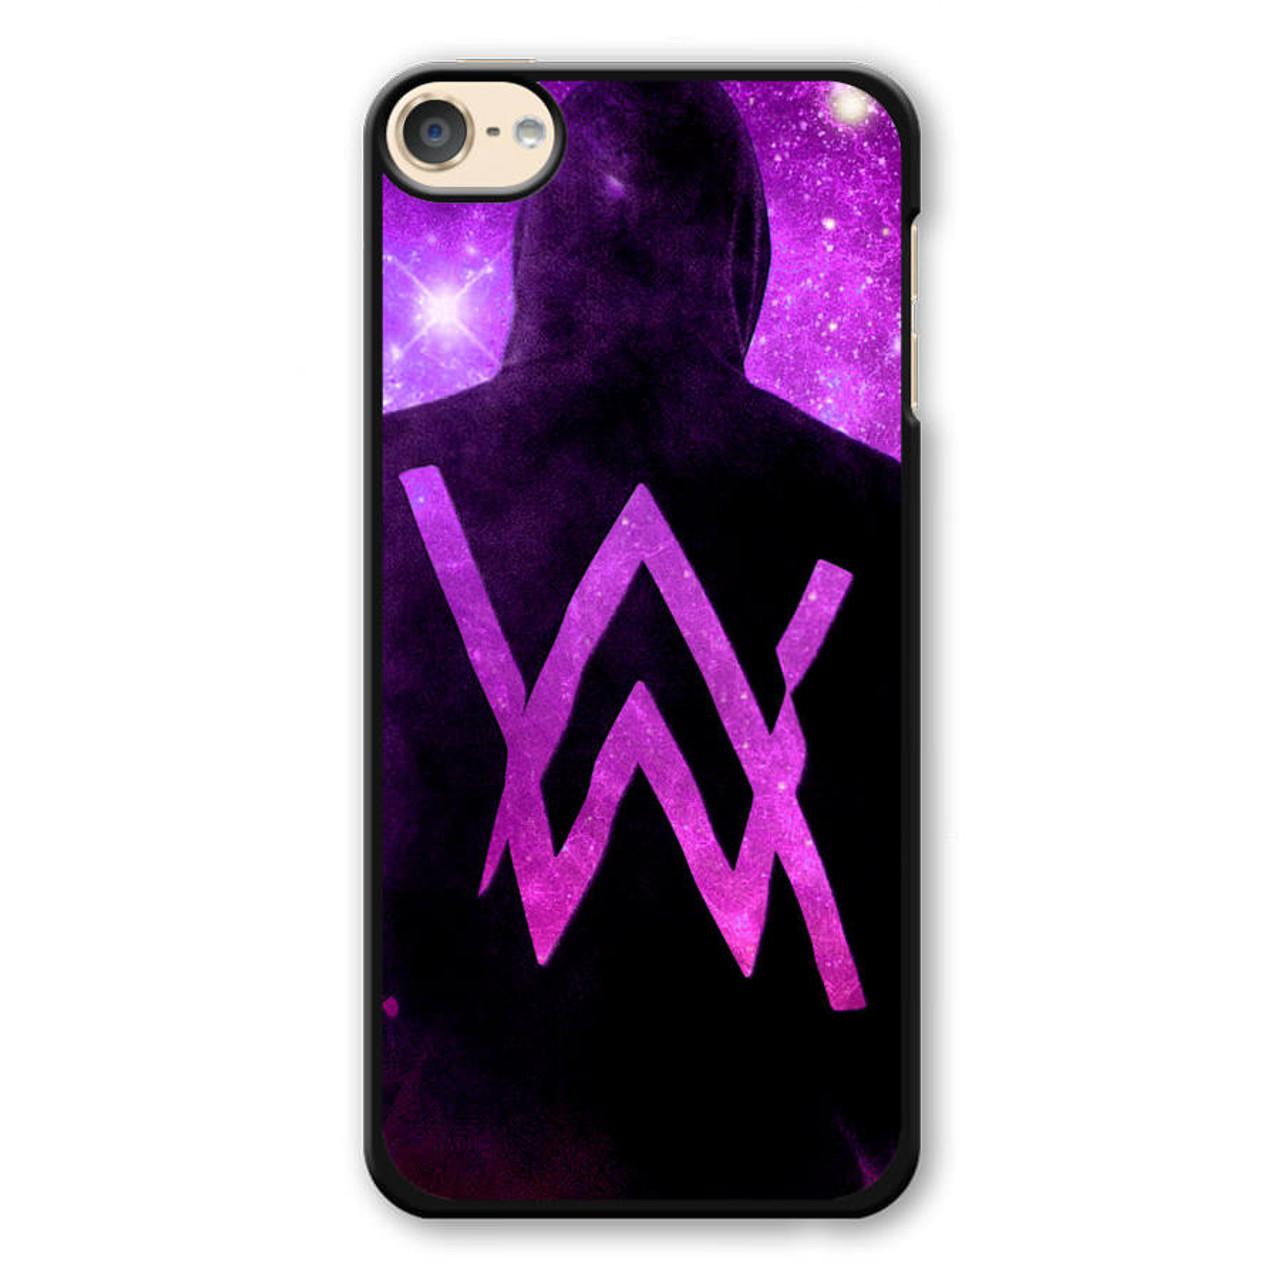 ea15f93bf37 Alan Walker iPod Touch 6 Case - CASESHUNTER